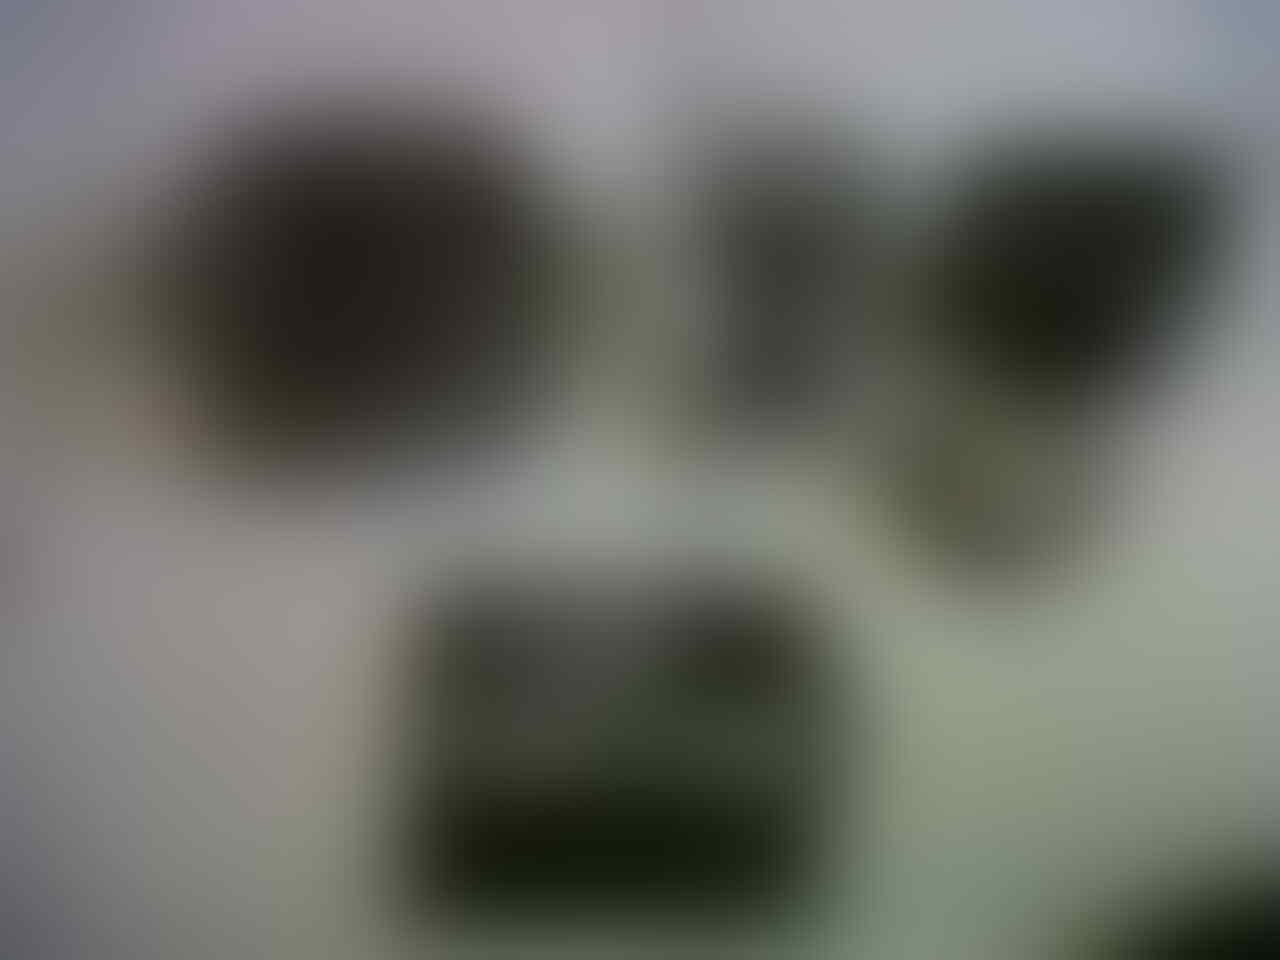 (WTS) BLOK SEHER + BLOK HEAD HONDA CB 100 MURAH BANGEEET!